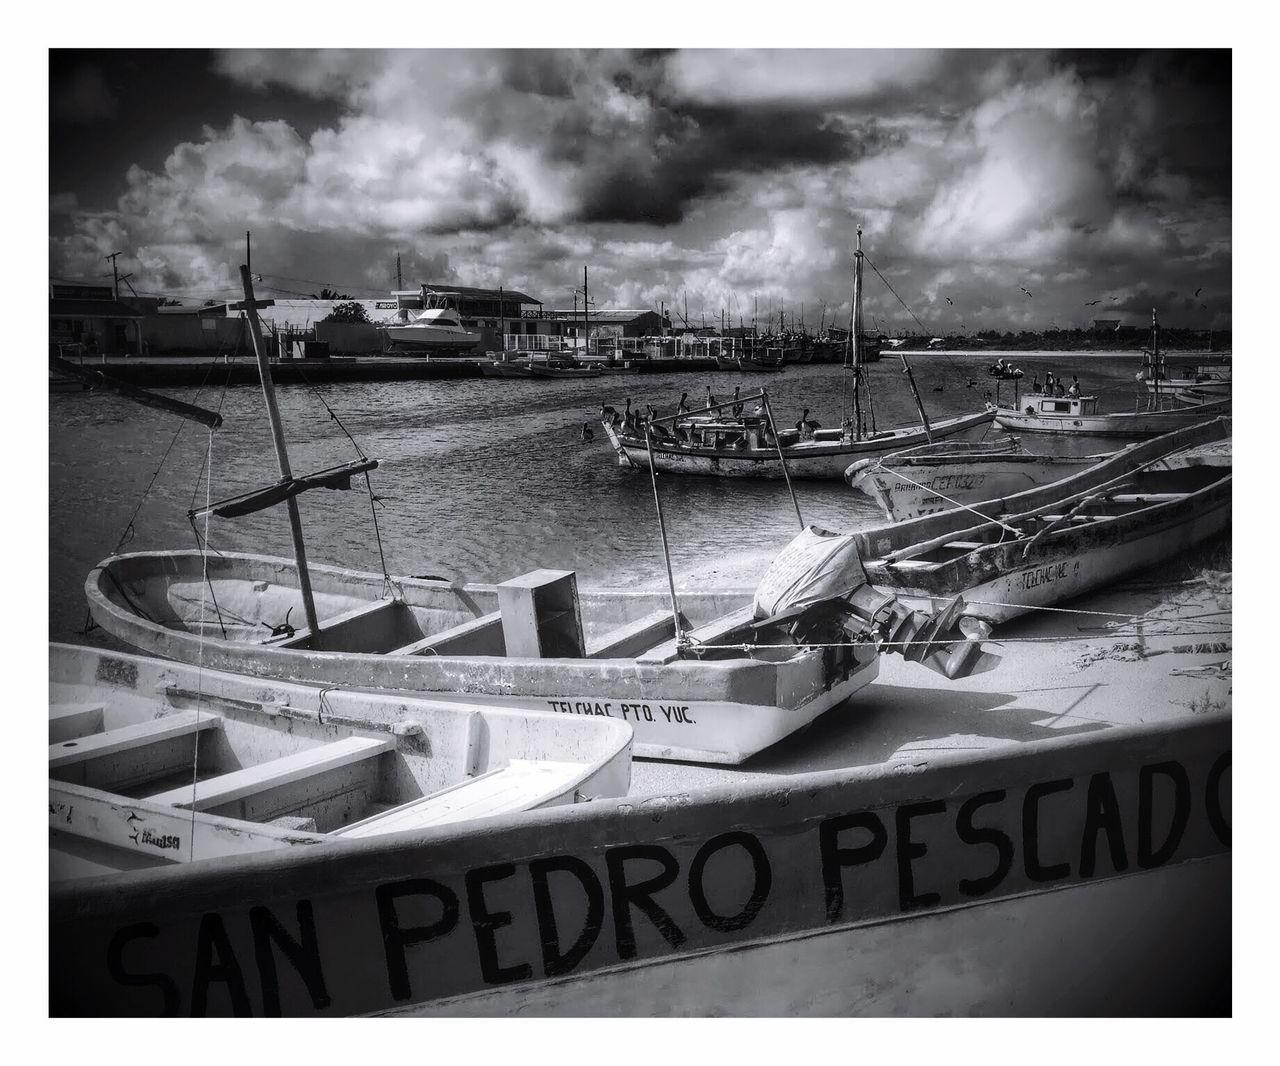 Water Boat Harbor Sky Sea Fishermen Fisherman Boat Fisherman Village Yucatan Mexico Yúcatan Storm Cloud Pelican Mexico Blackandwhite